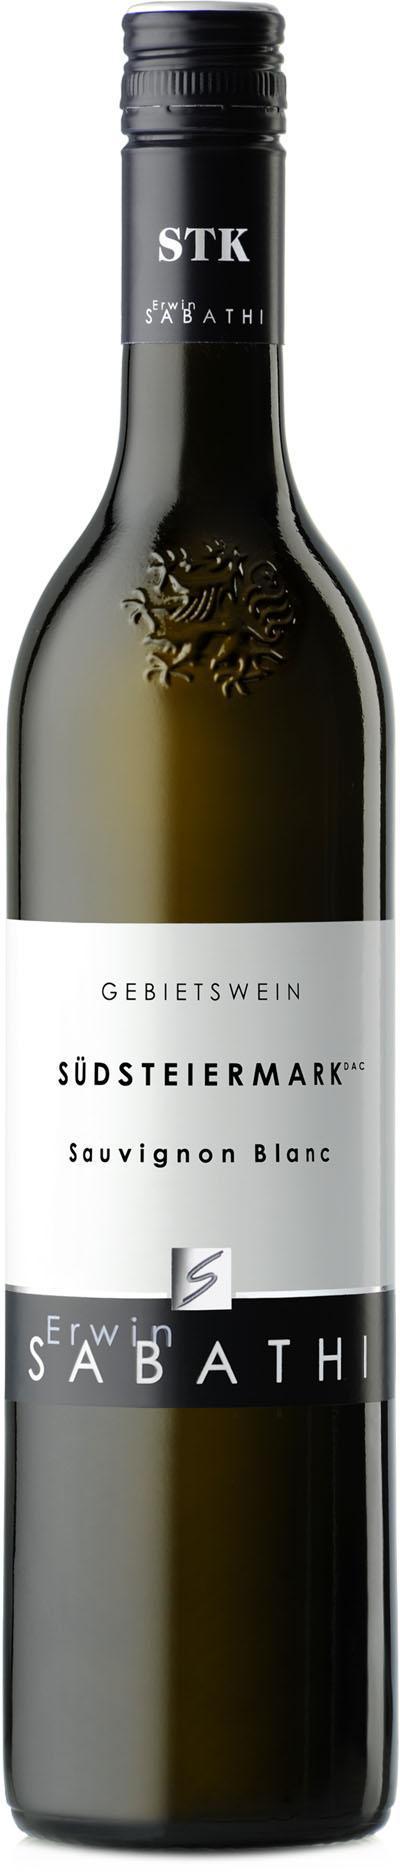 Sauvignon Blanc Südsteiermark DAC  2019 / Sabathi Erwin